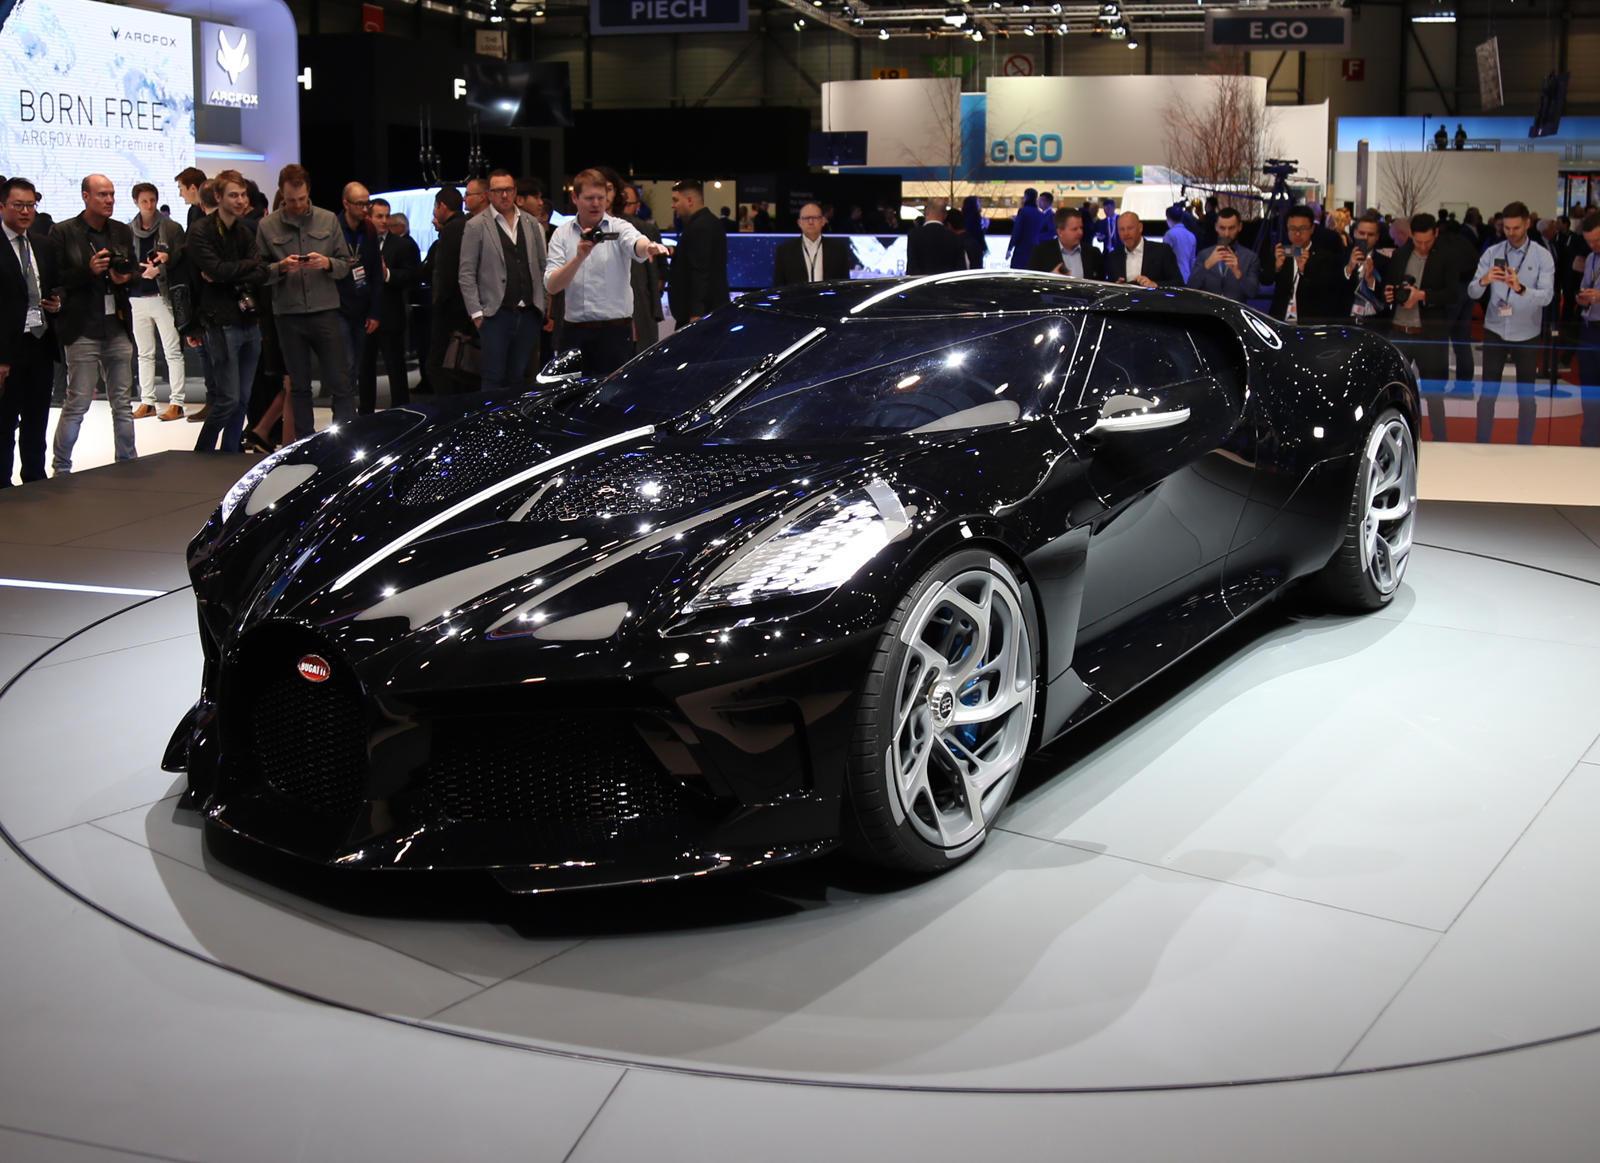 siêu xe Ý,siêu xe Bugatti,Lamborghini